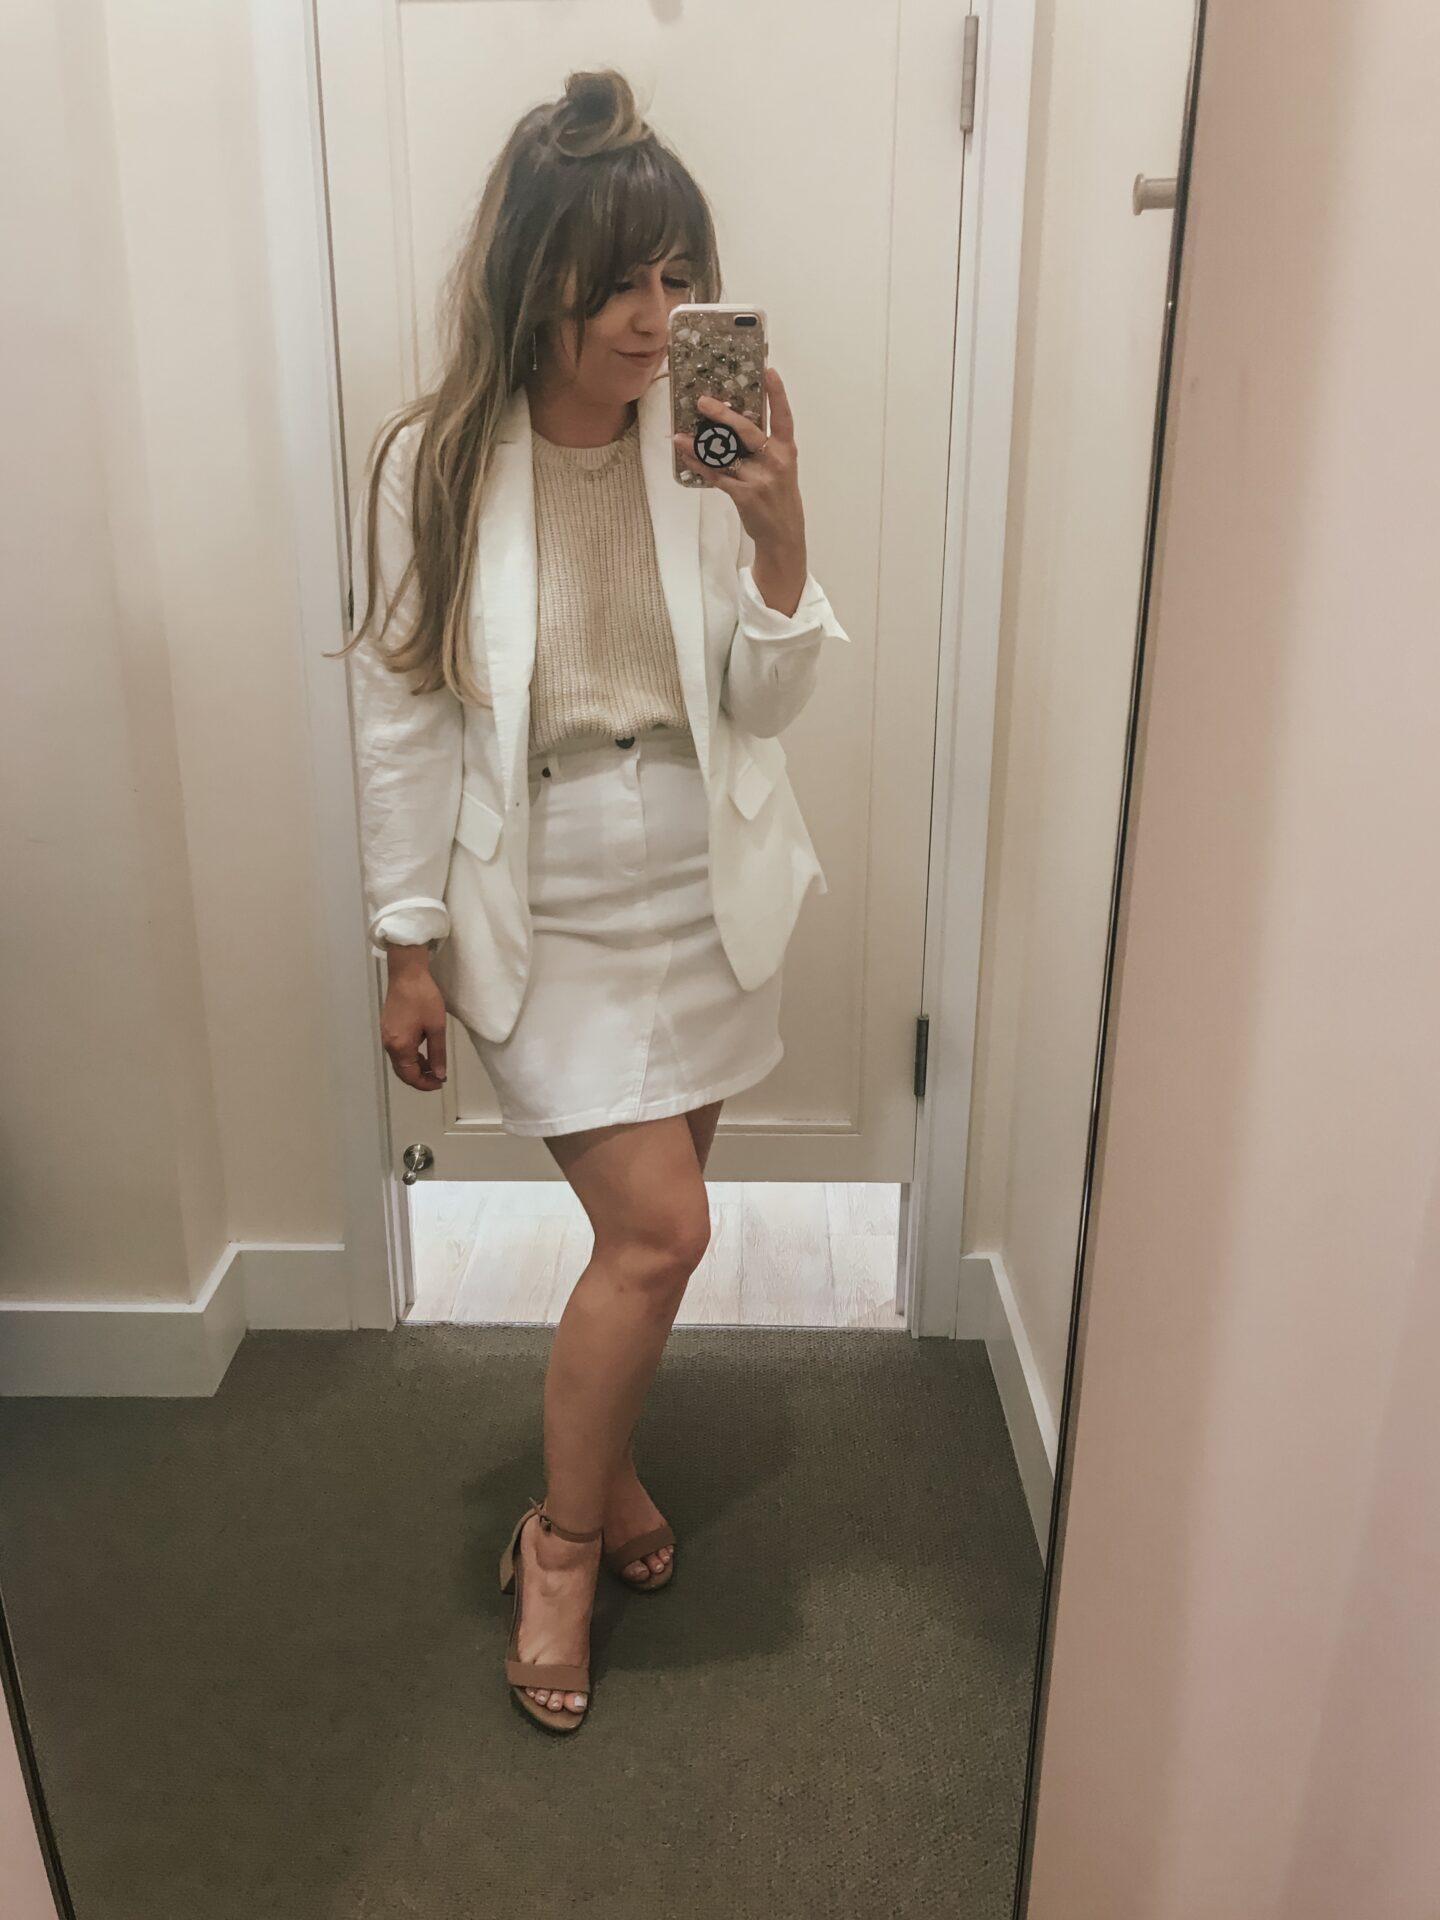 LOFT Spring - white denim skirt and blazer outfit